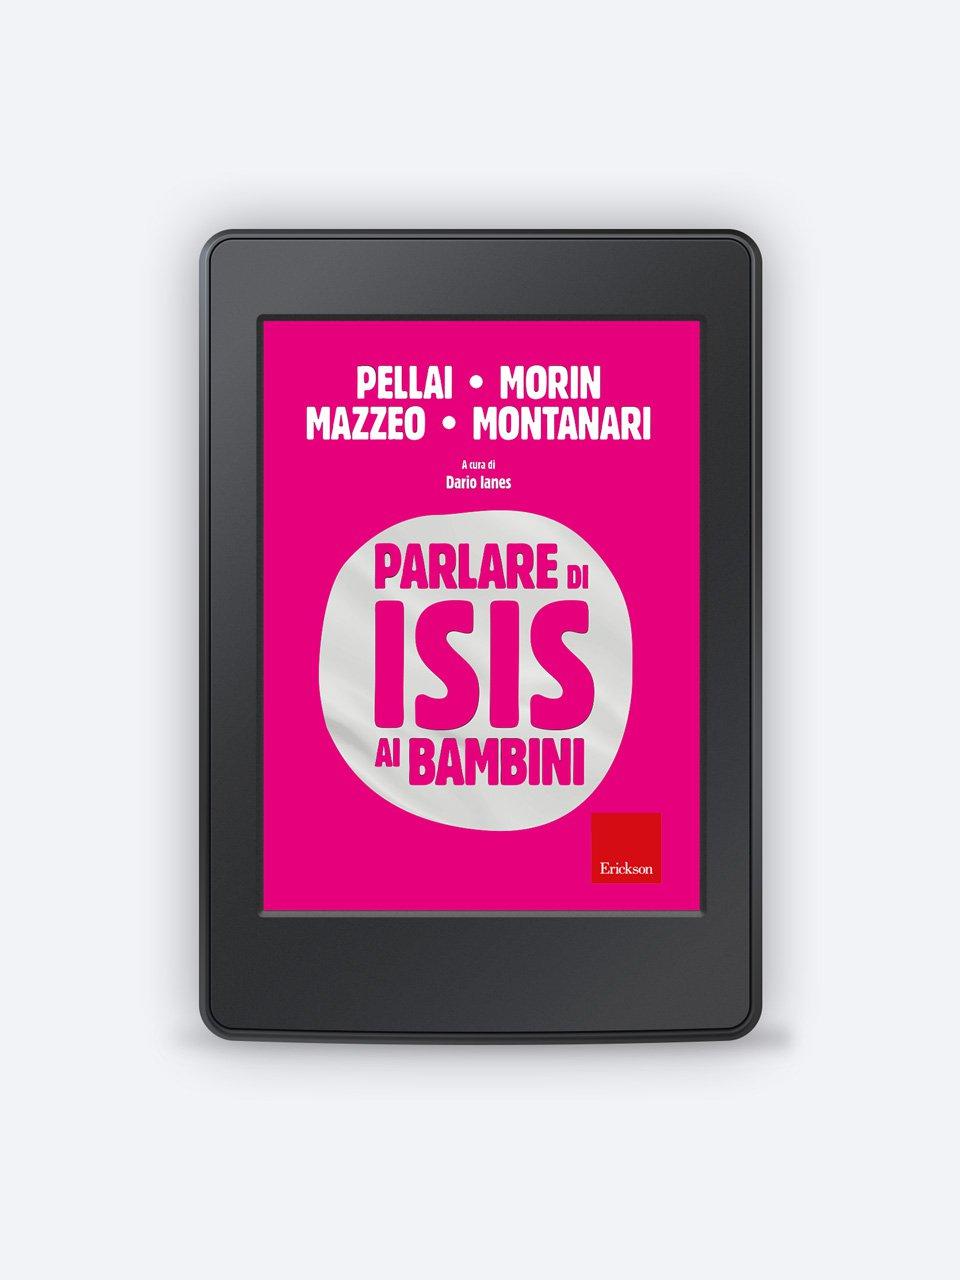 Parlare di ISIS ai bambini - Libri - Erickson 3